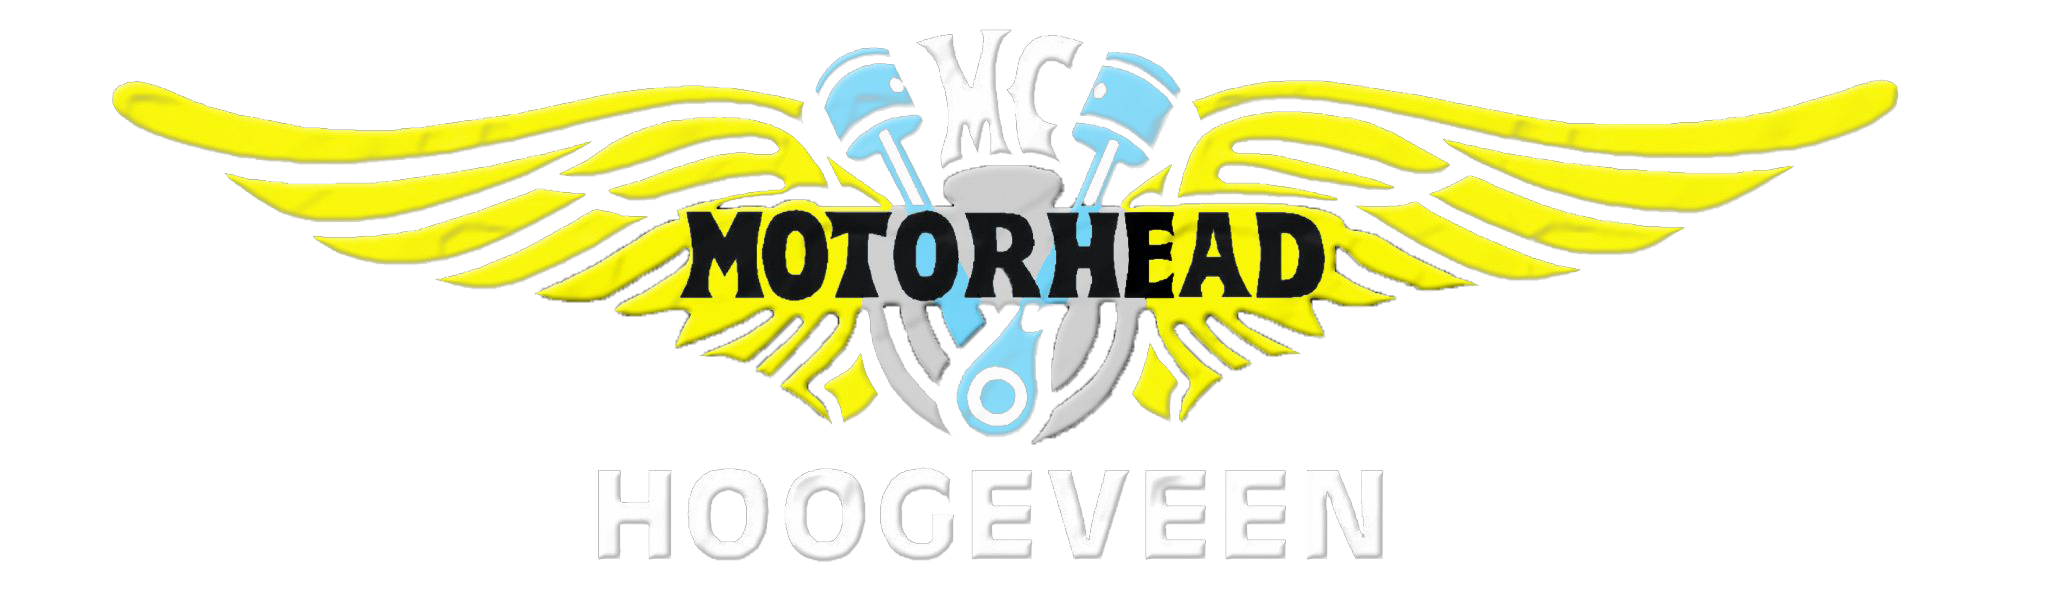 mc motorhead